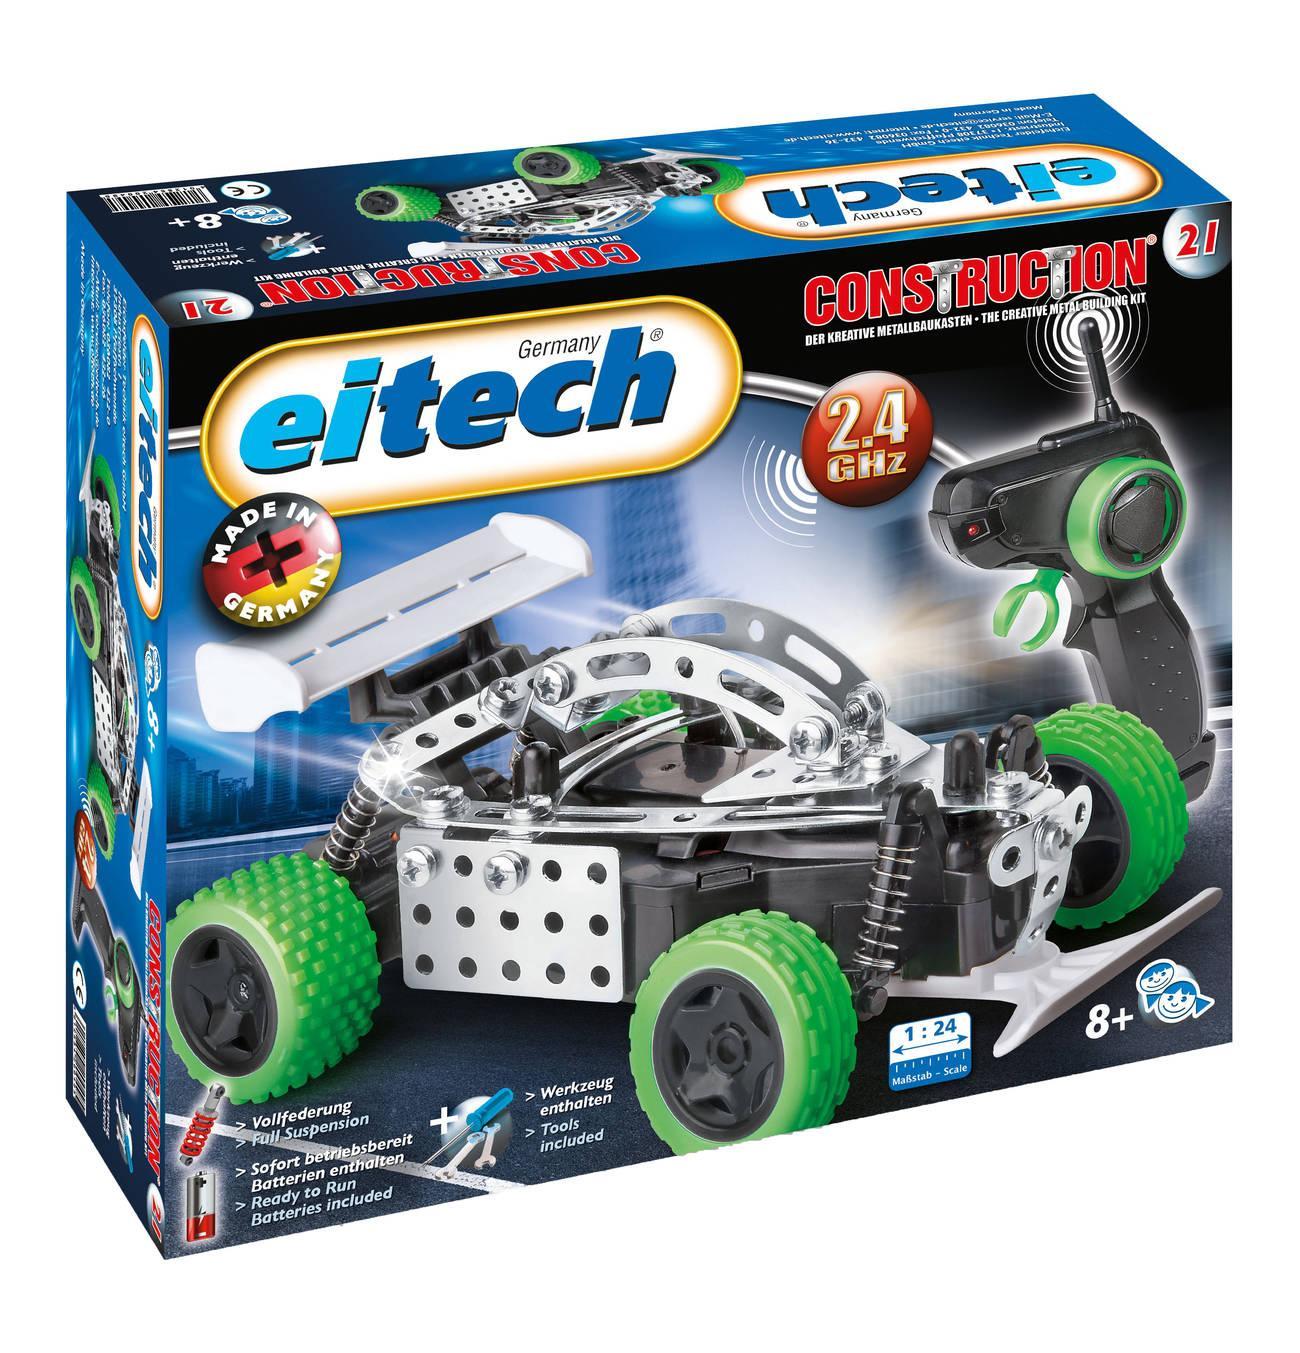 EITECH RC SPEED RACER 2.4G C 21